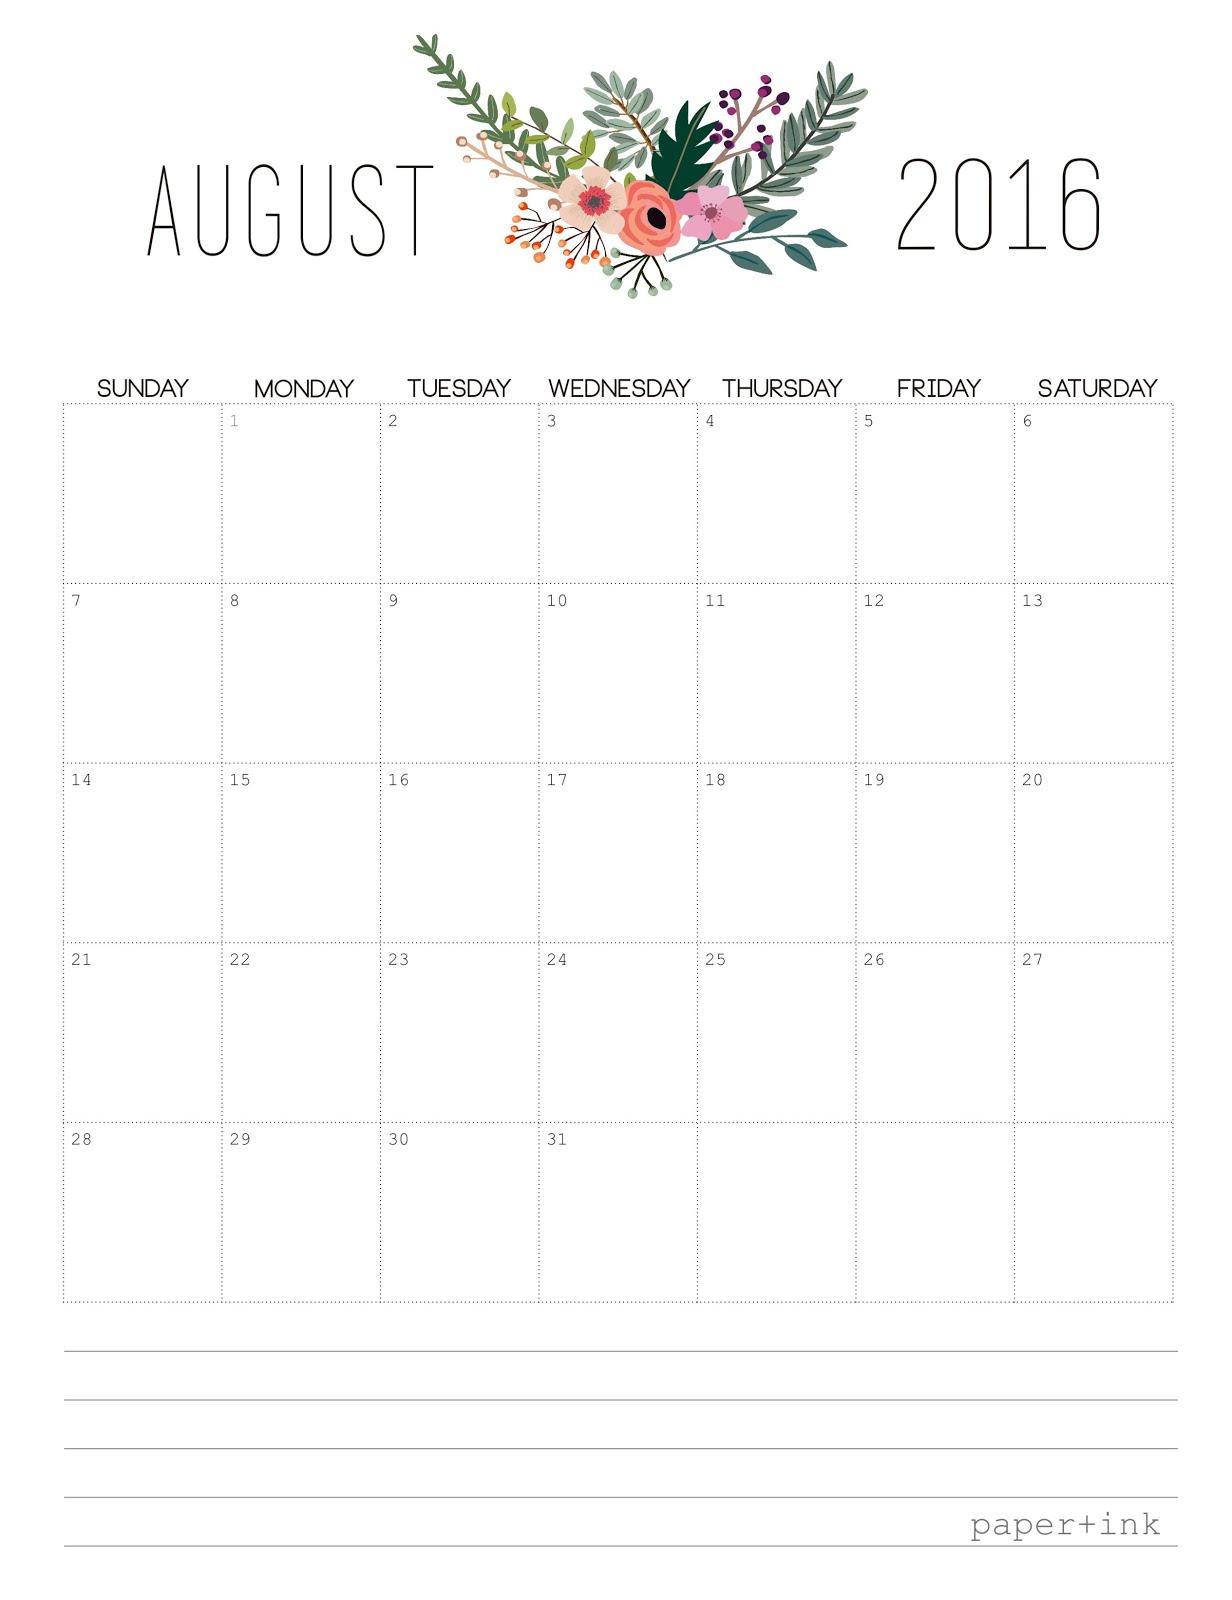 Free Printable : August 2016 Calendar